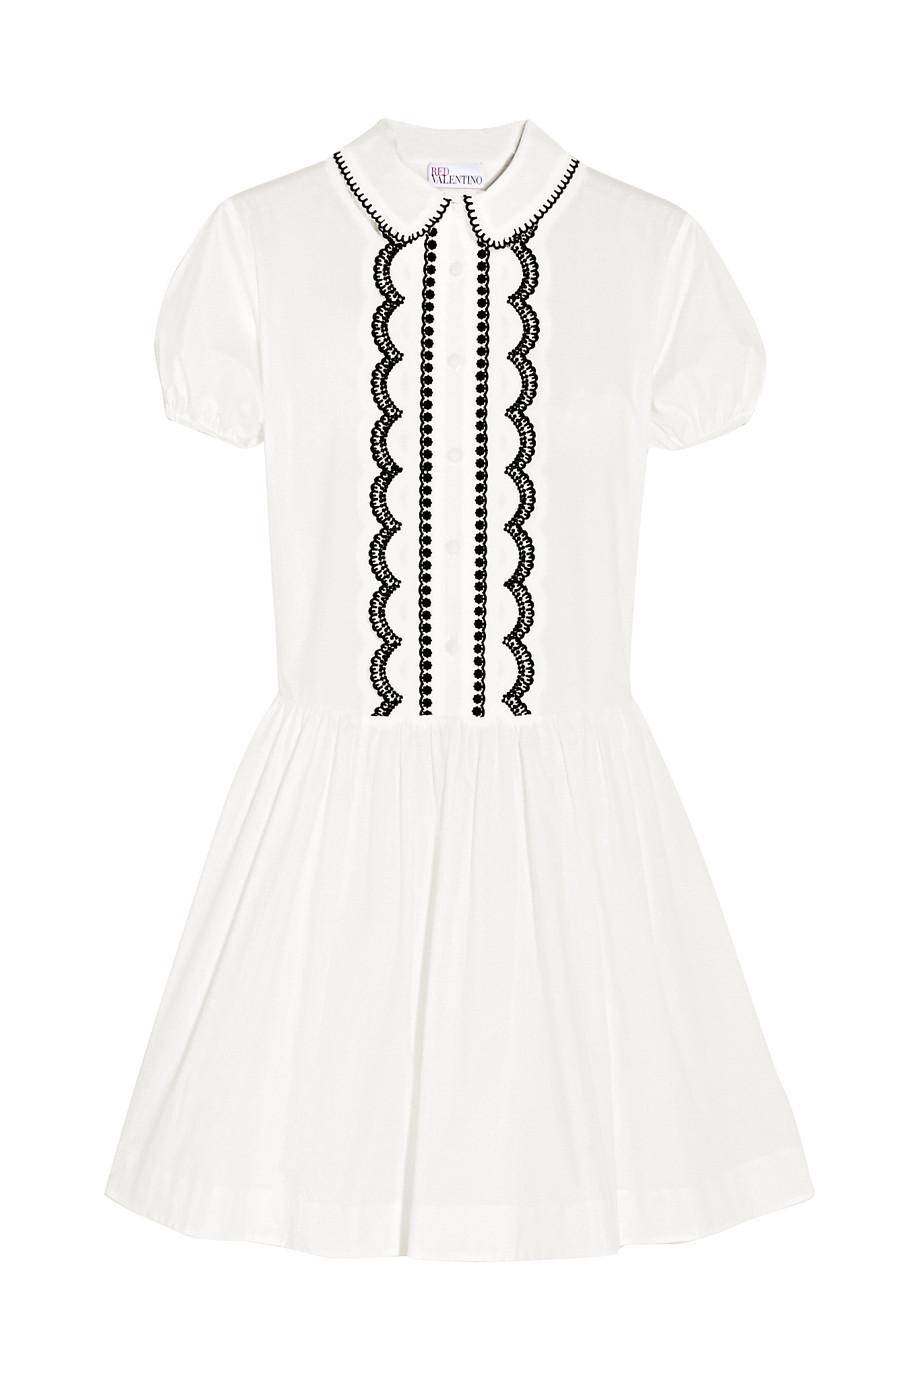 Redvalentino Embroidered Cotton-Poplin Mini Dress, White, Women's - Embroidered, Size: 40